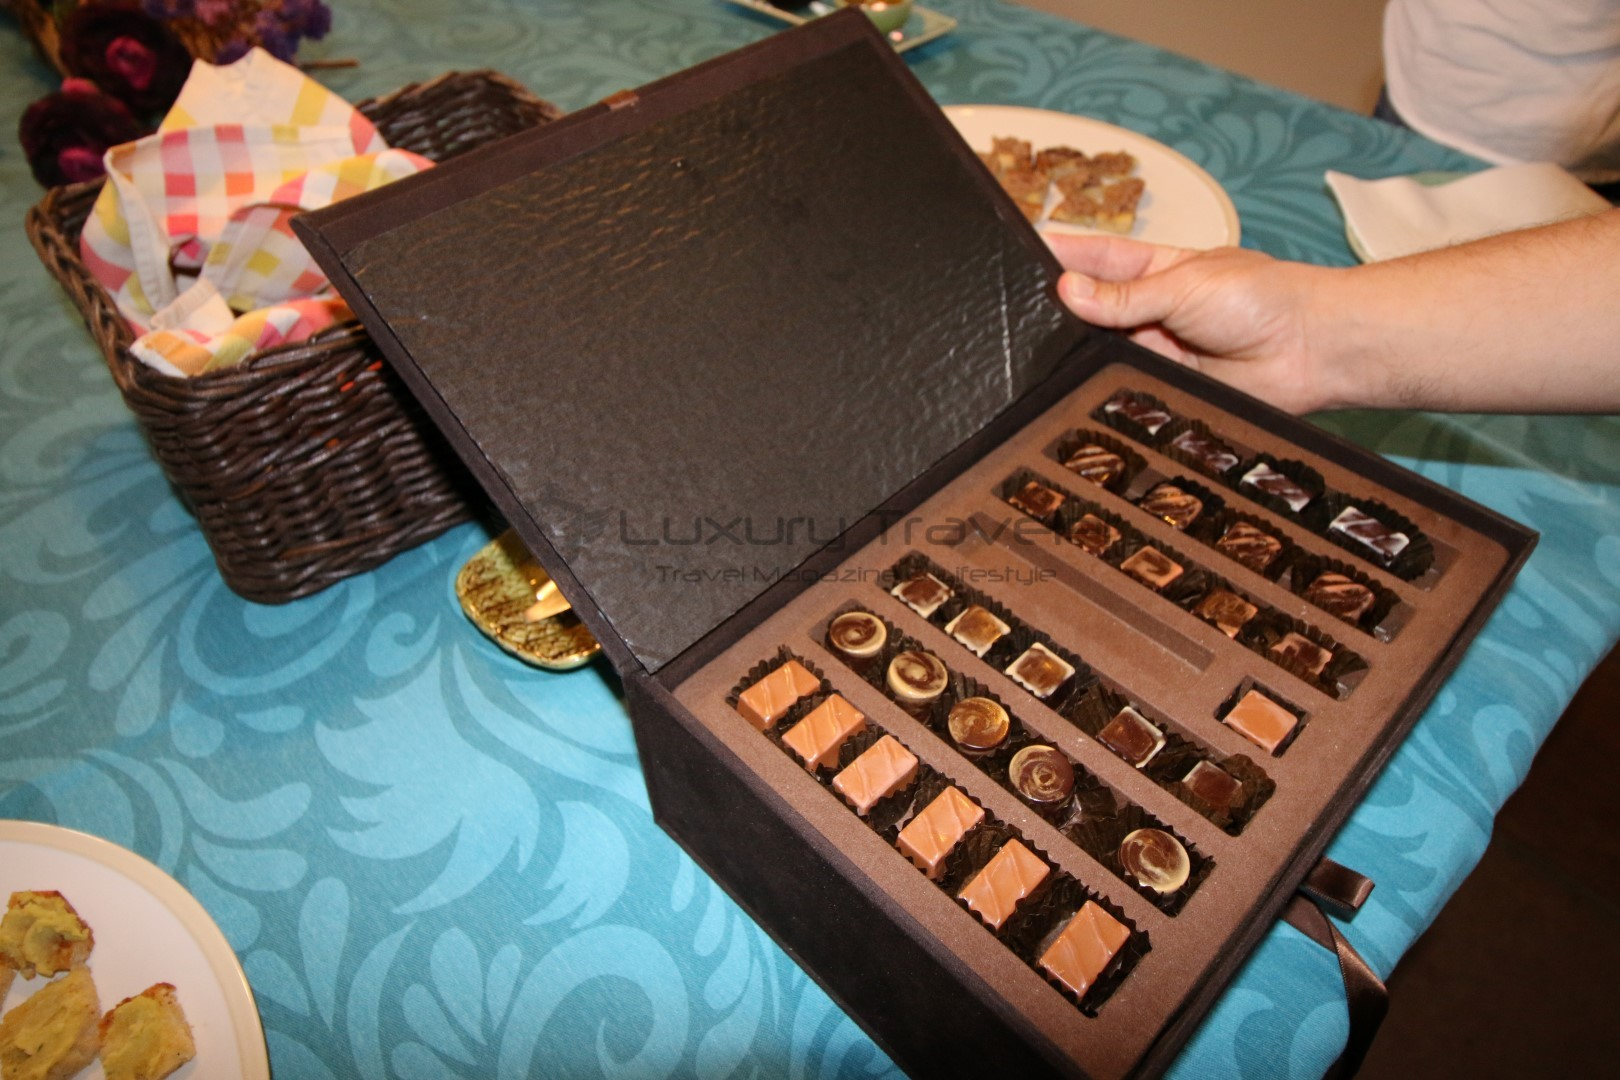 Royal_Cocoa_Company_Palace_Hotel_Chocolate_Cacau_Montemor